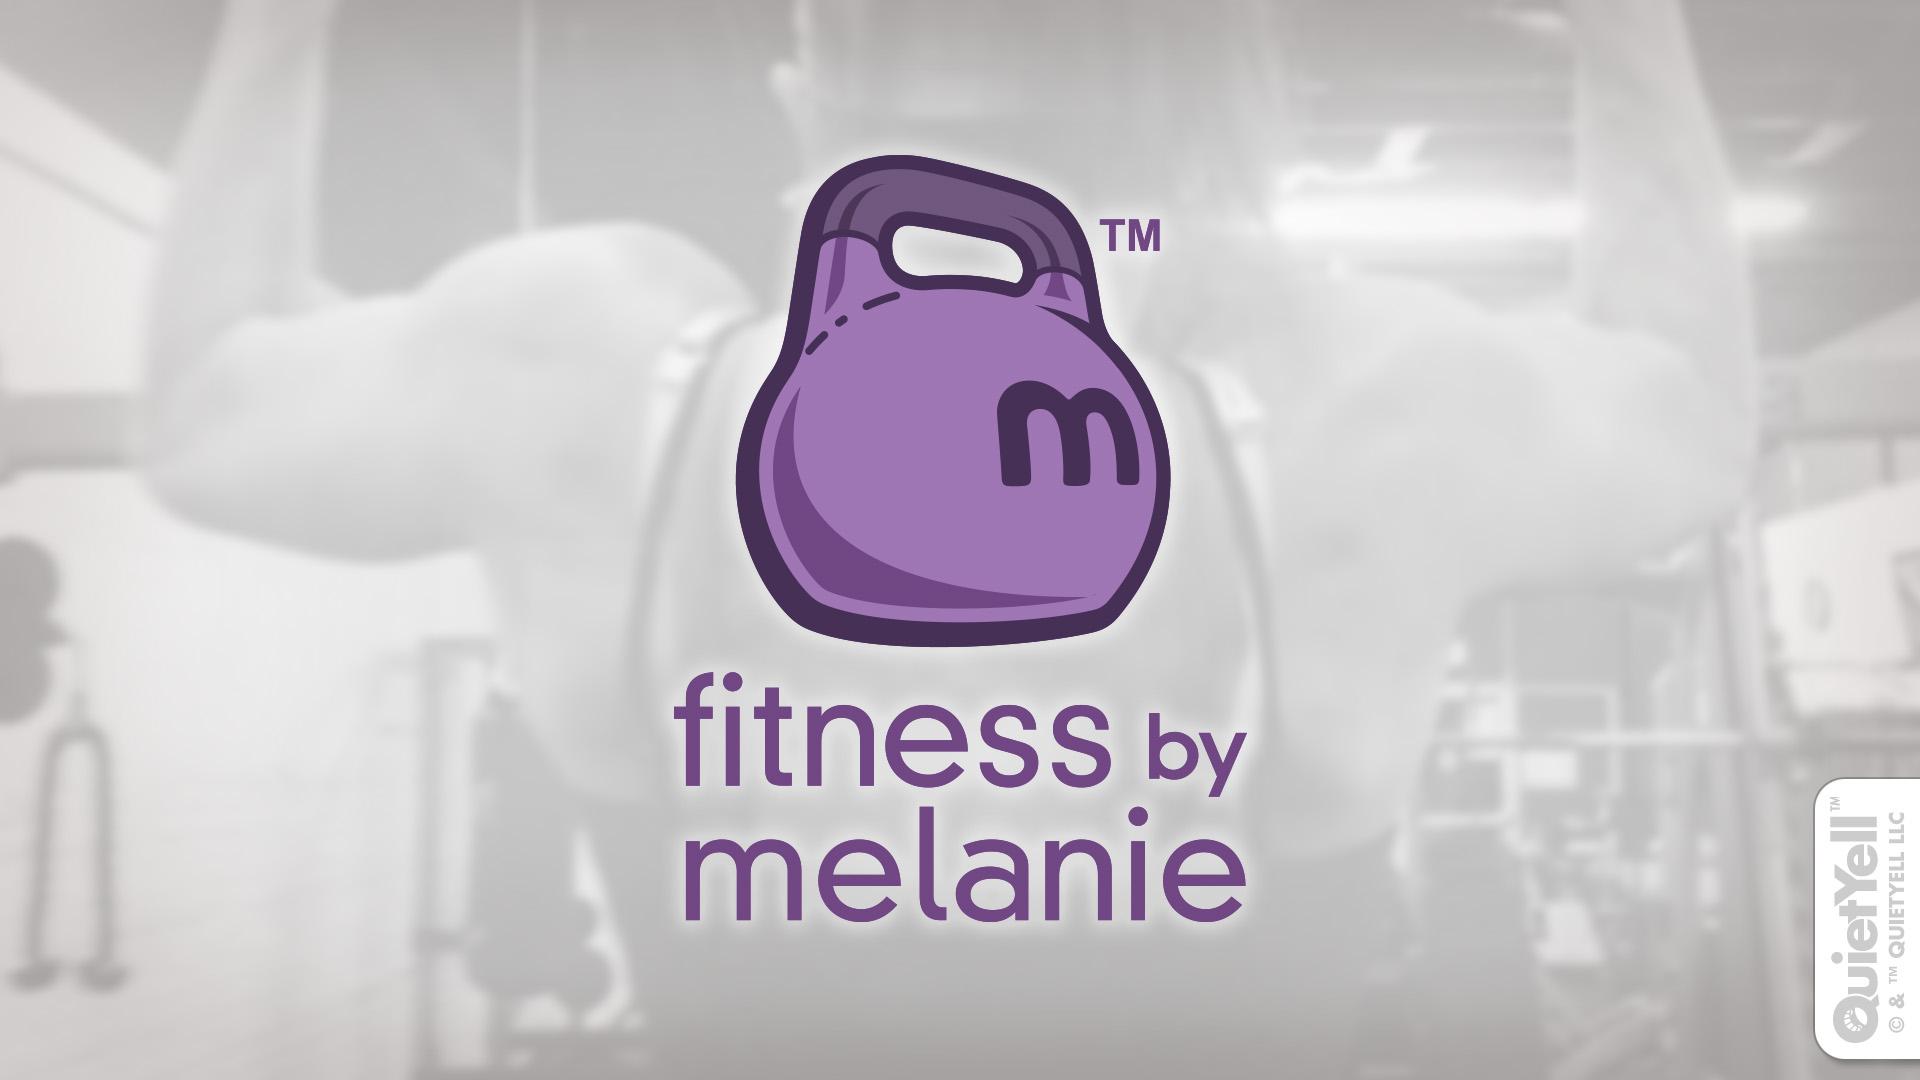 quietyell_branding_full_fitnessbymelanie_01